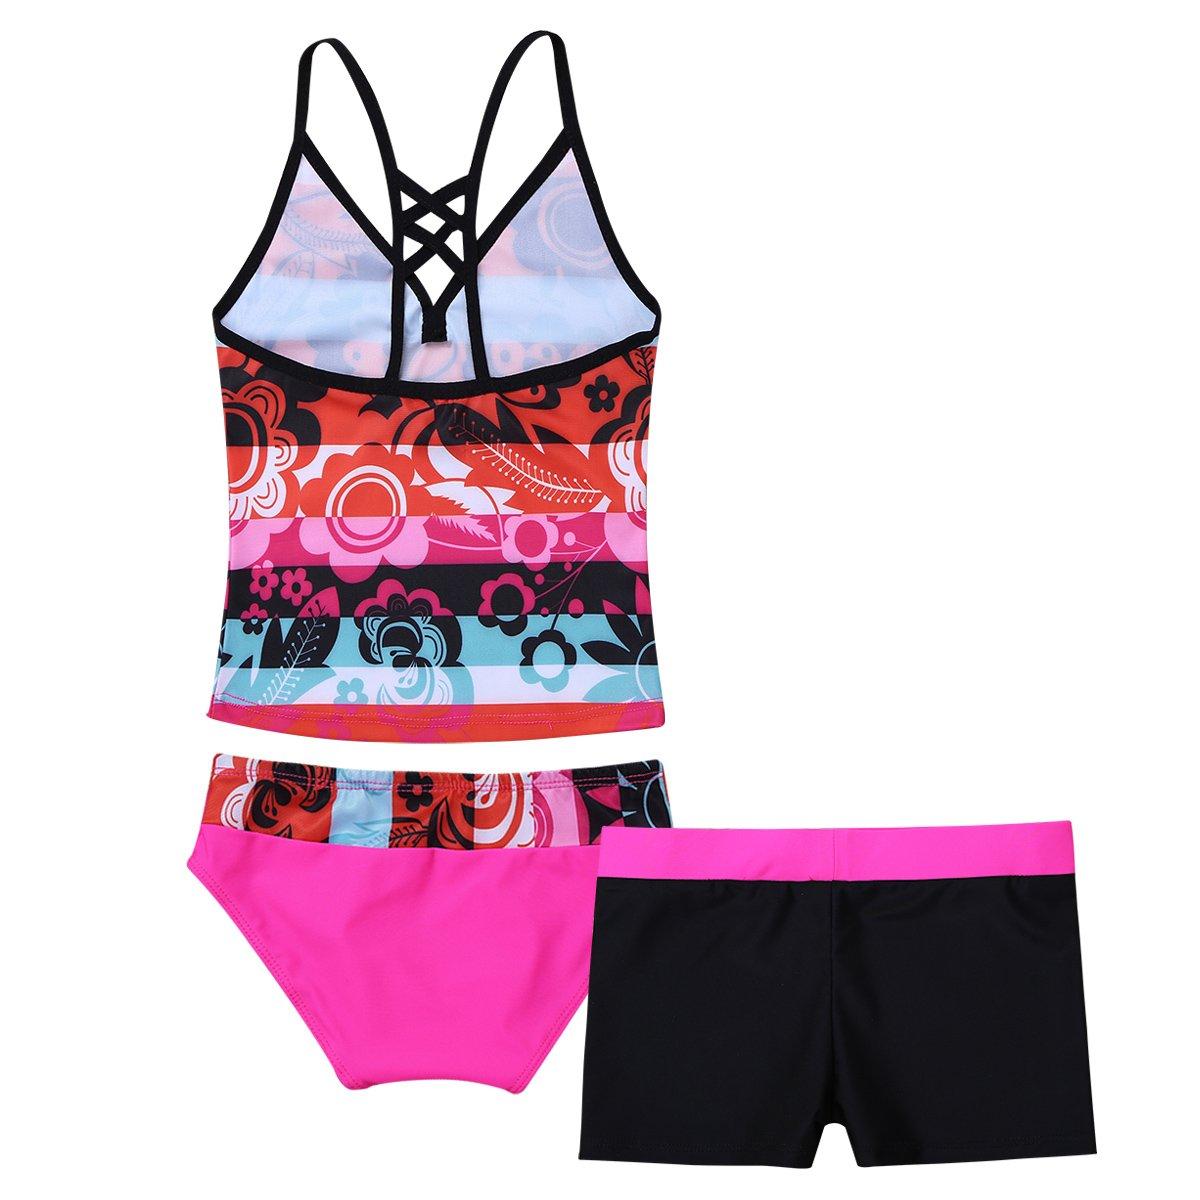 Badeset Tops Slips mit Shorts Blumen Muster Bikini Sets Mädchen Badeanzug 3tlg